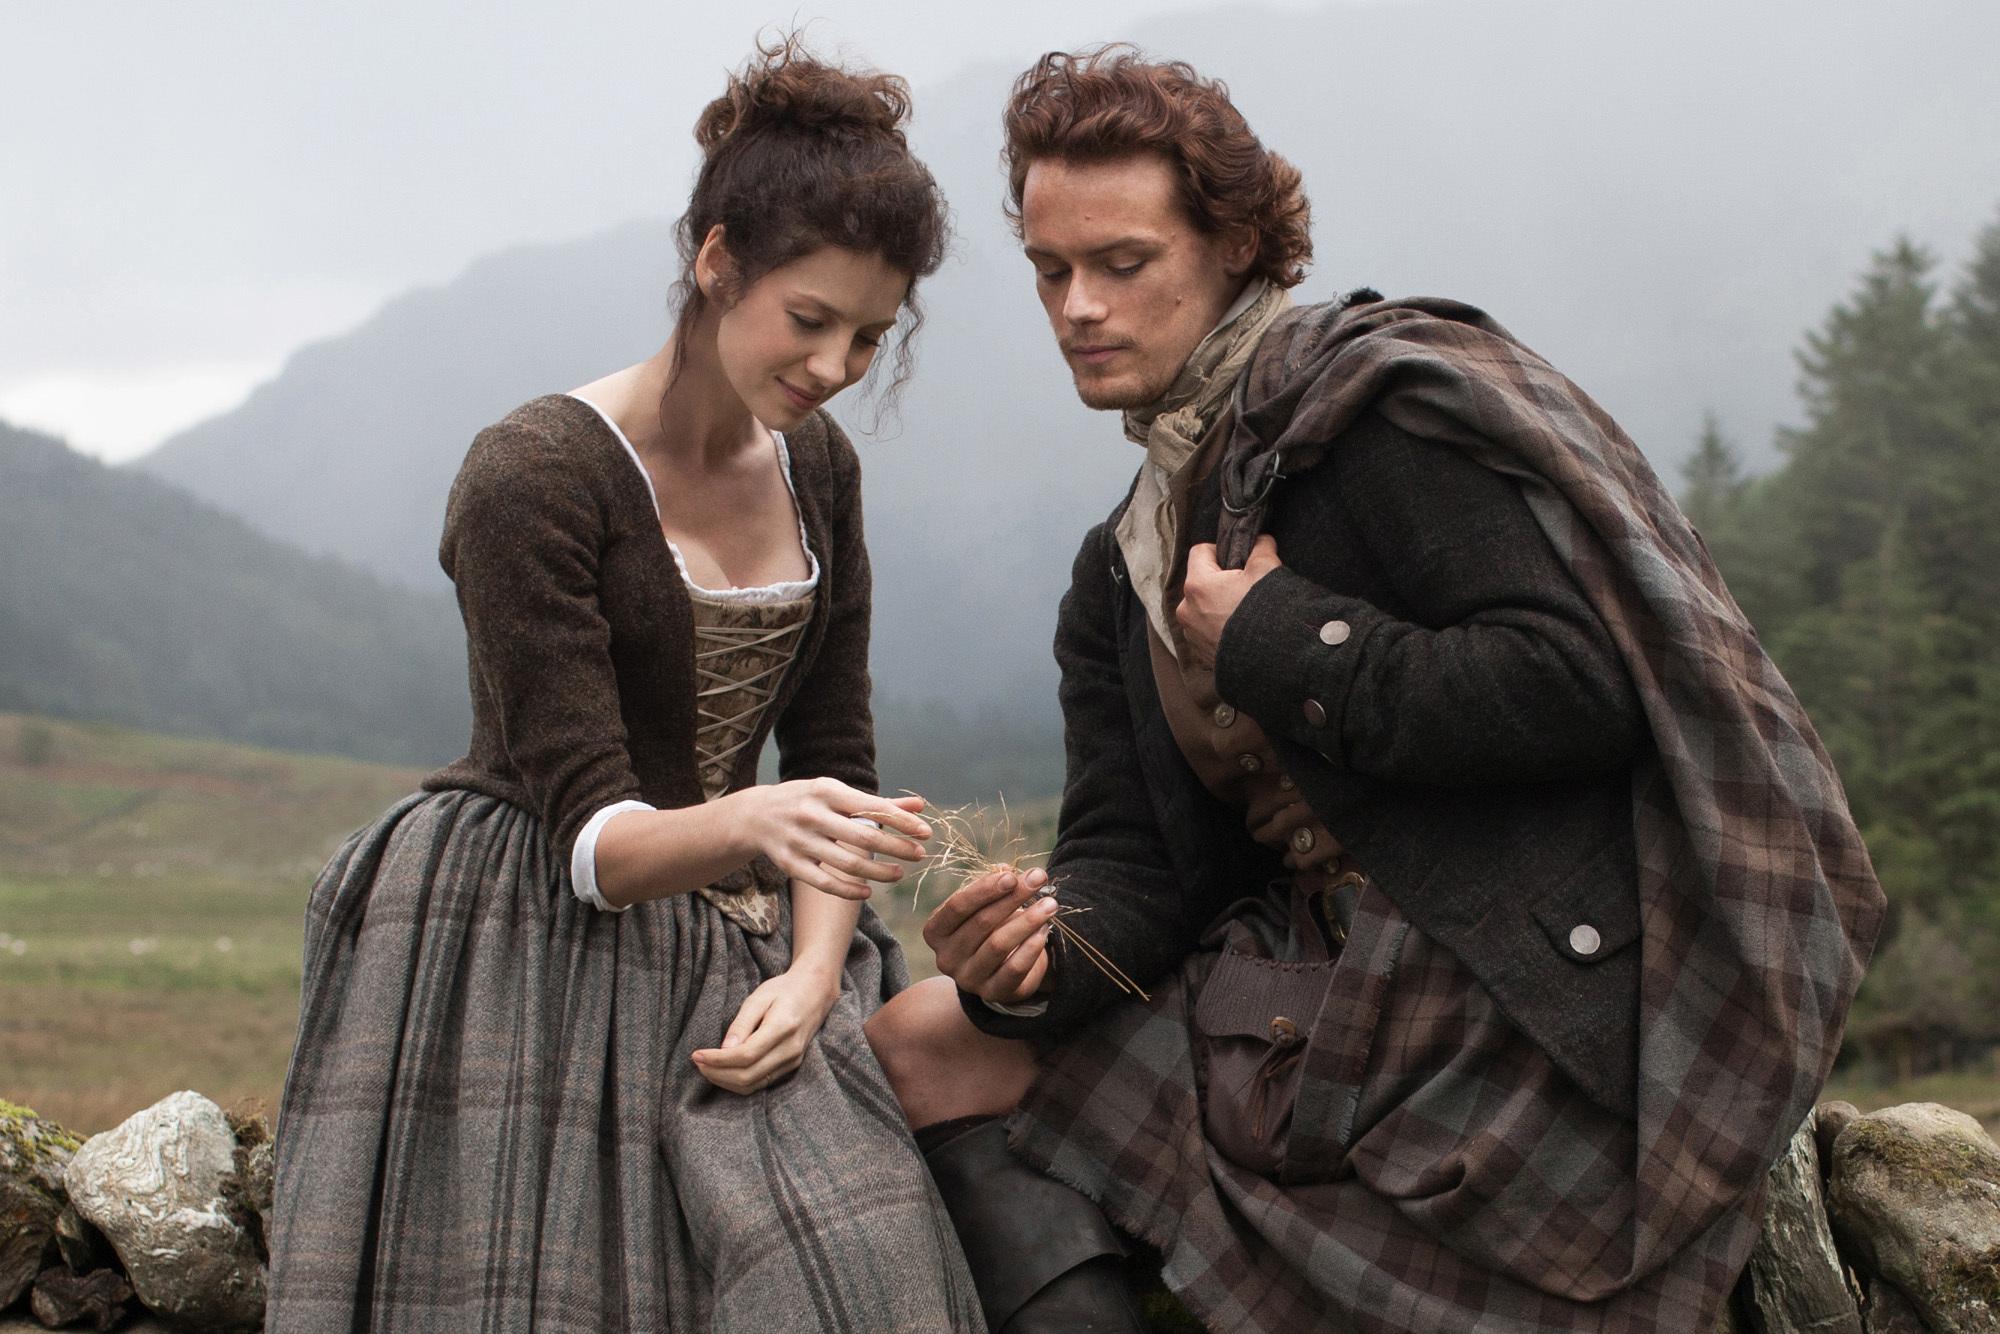 Outlander: Claire Randall (Caitriona Balfe) and Jamie Fraser (Sam Heugan) (Nick Briggs/Sony)